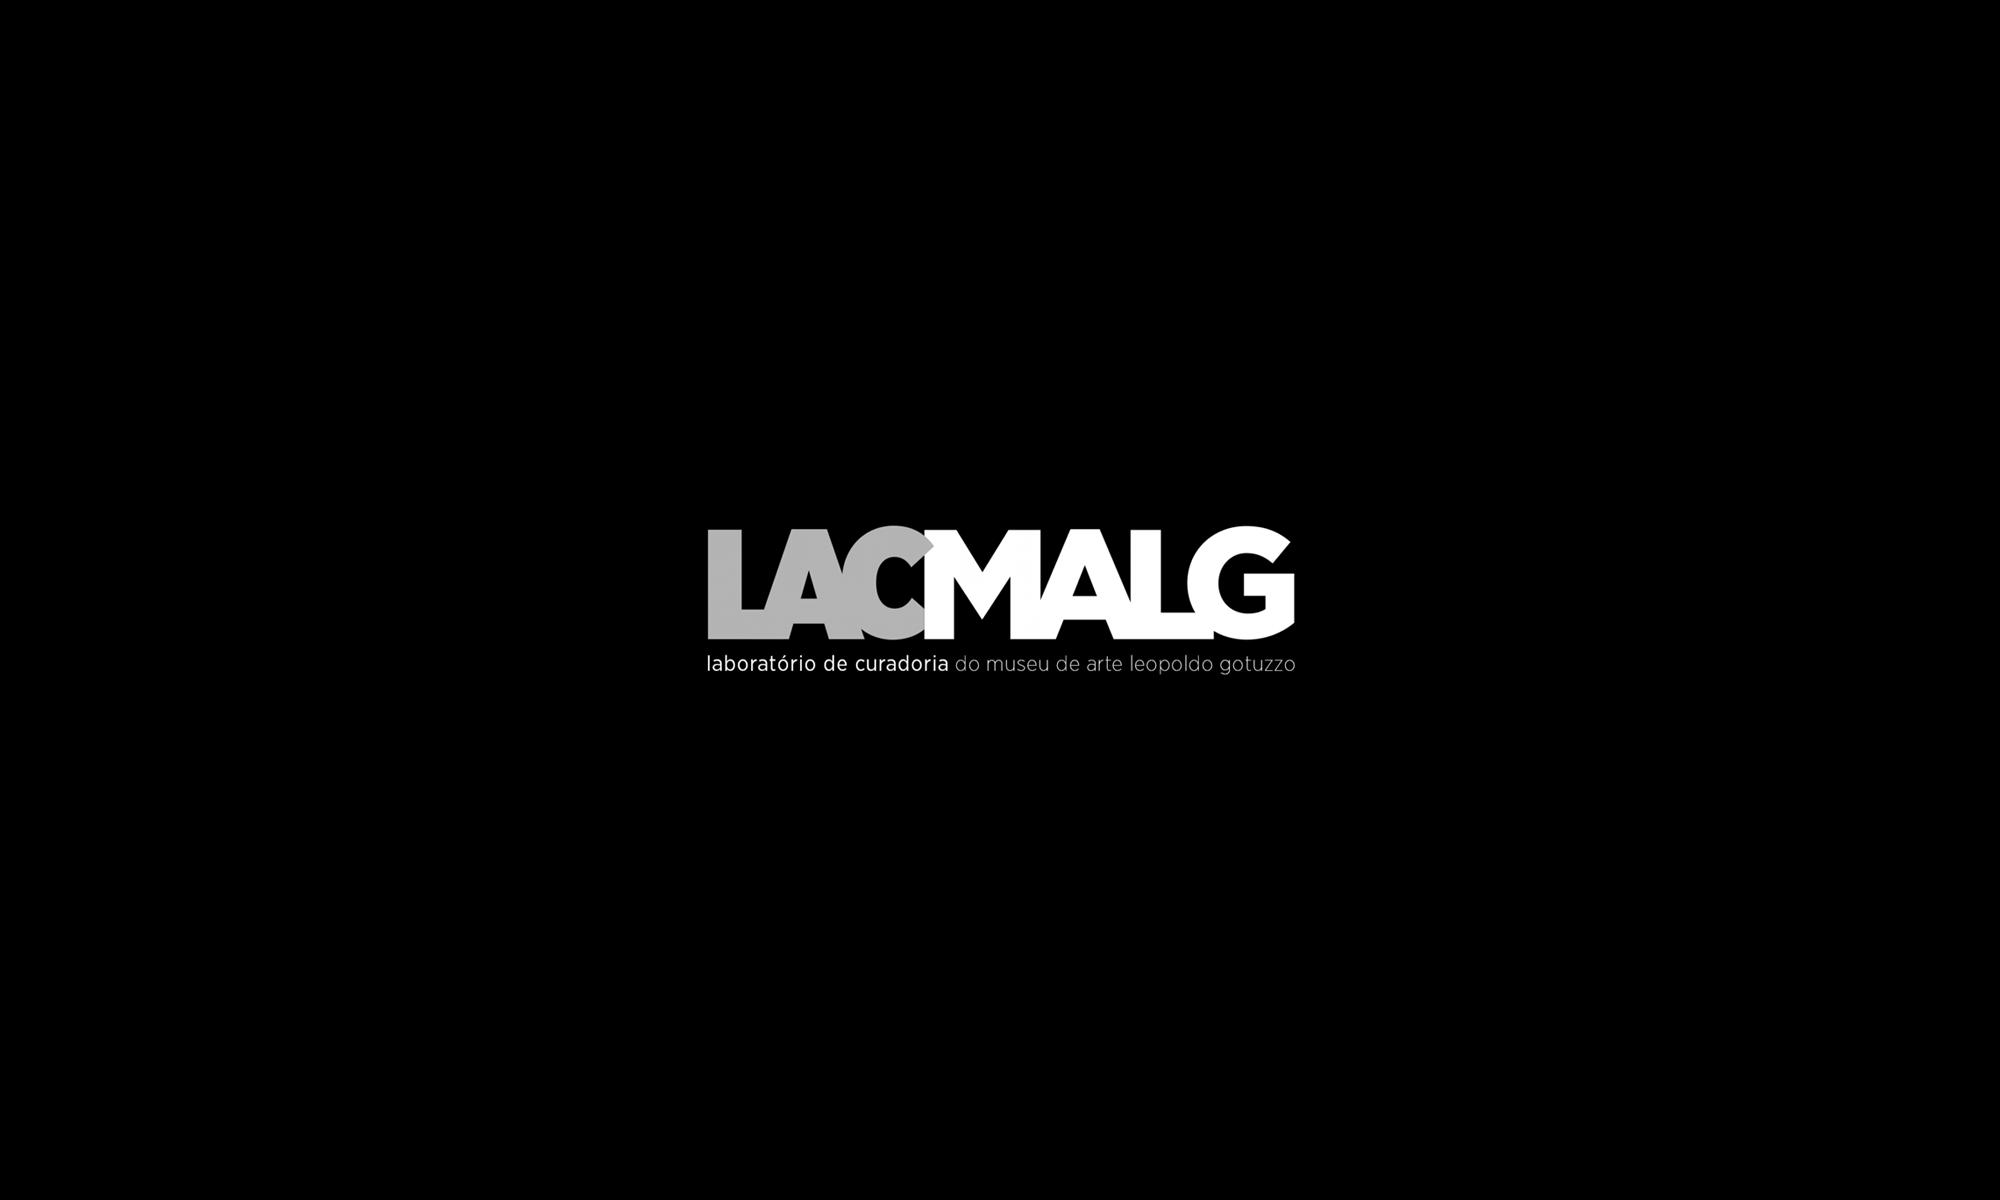 LACMALG